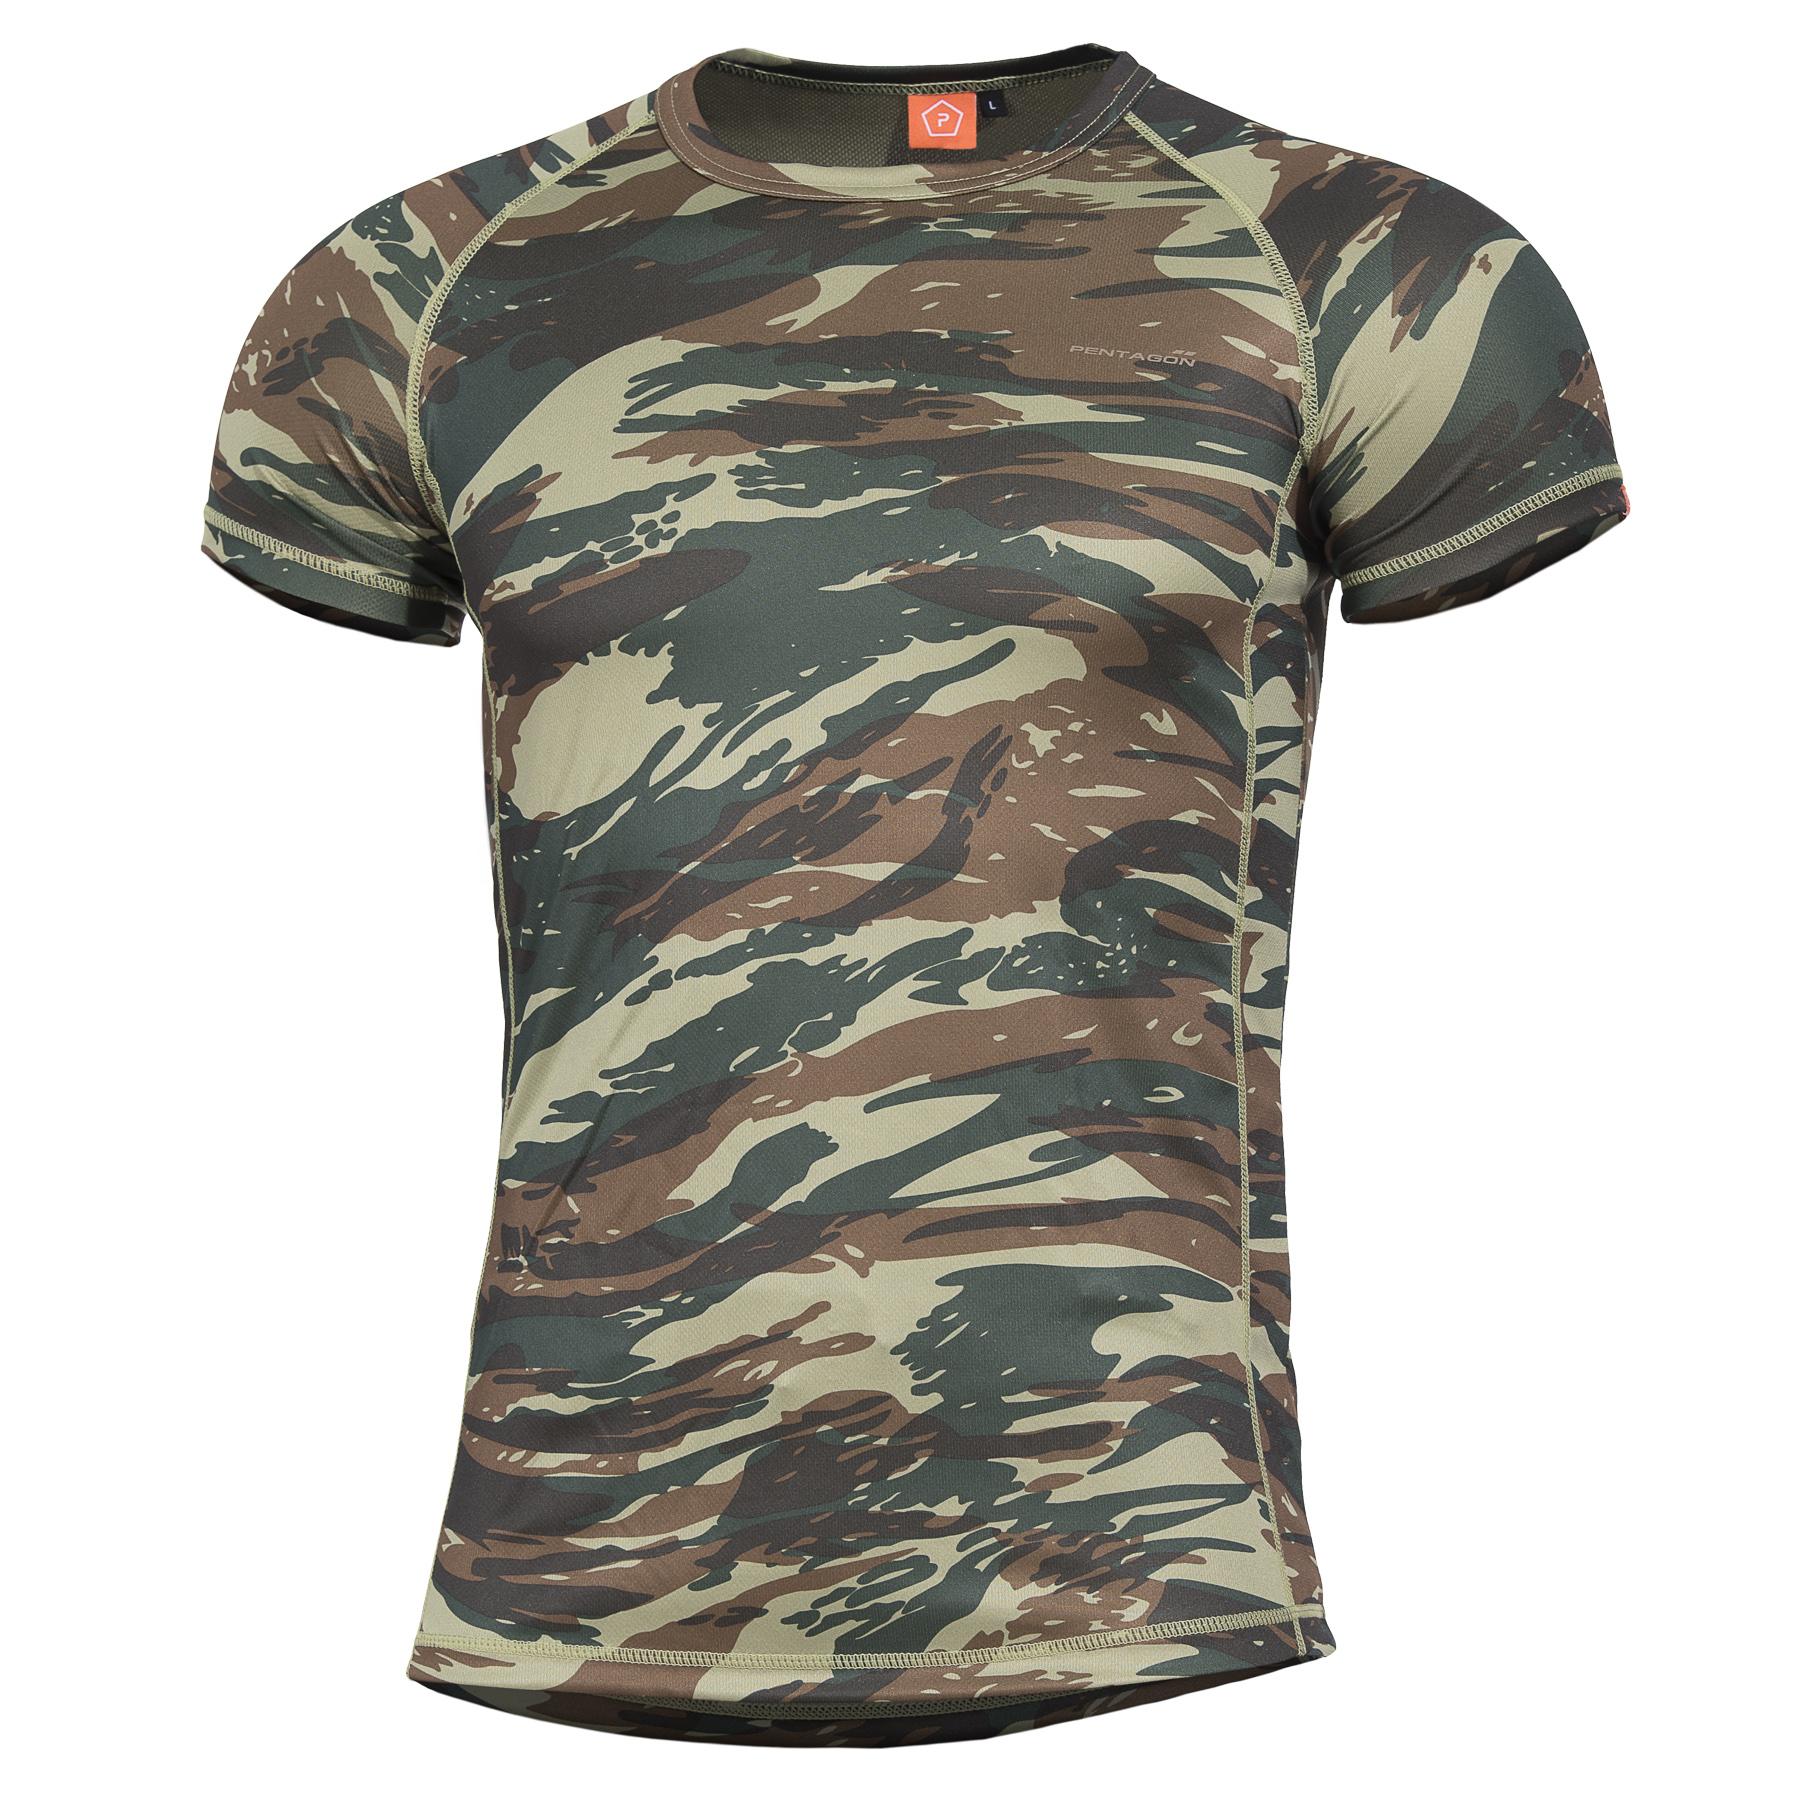 424a8511d6 Μπλουζάκι PENTAGON BODY SHOCK Παραλλαγή (K09003-56)